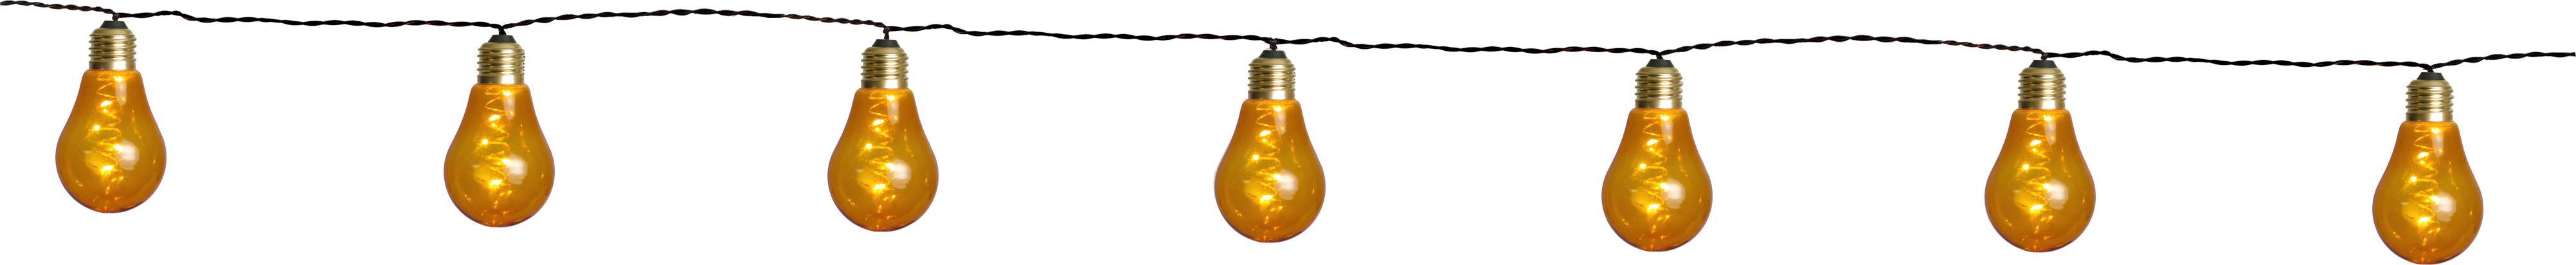 LED lichtslinger Bulb, 360 cm, Peertje: kunststof, metaal, Peertje: amberkleurig, goudkleurig. Snoer: zwart, L 360 cm